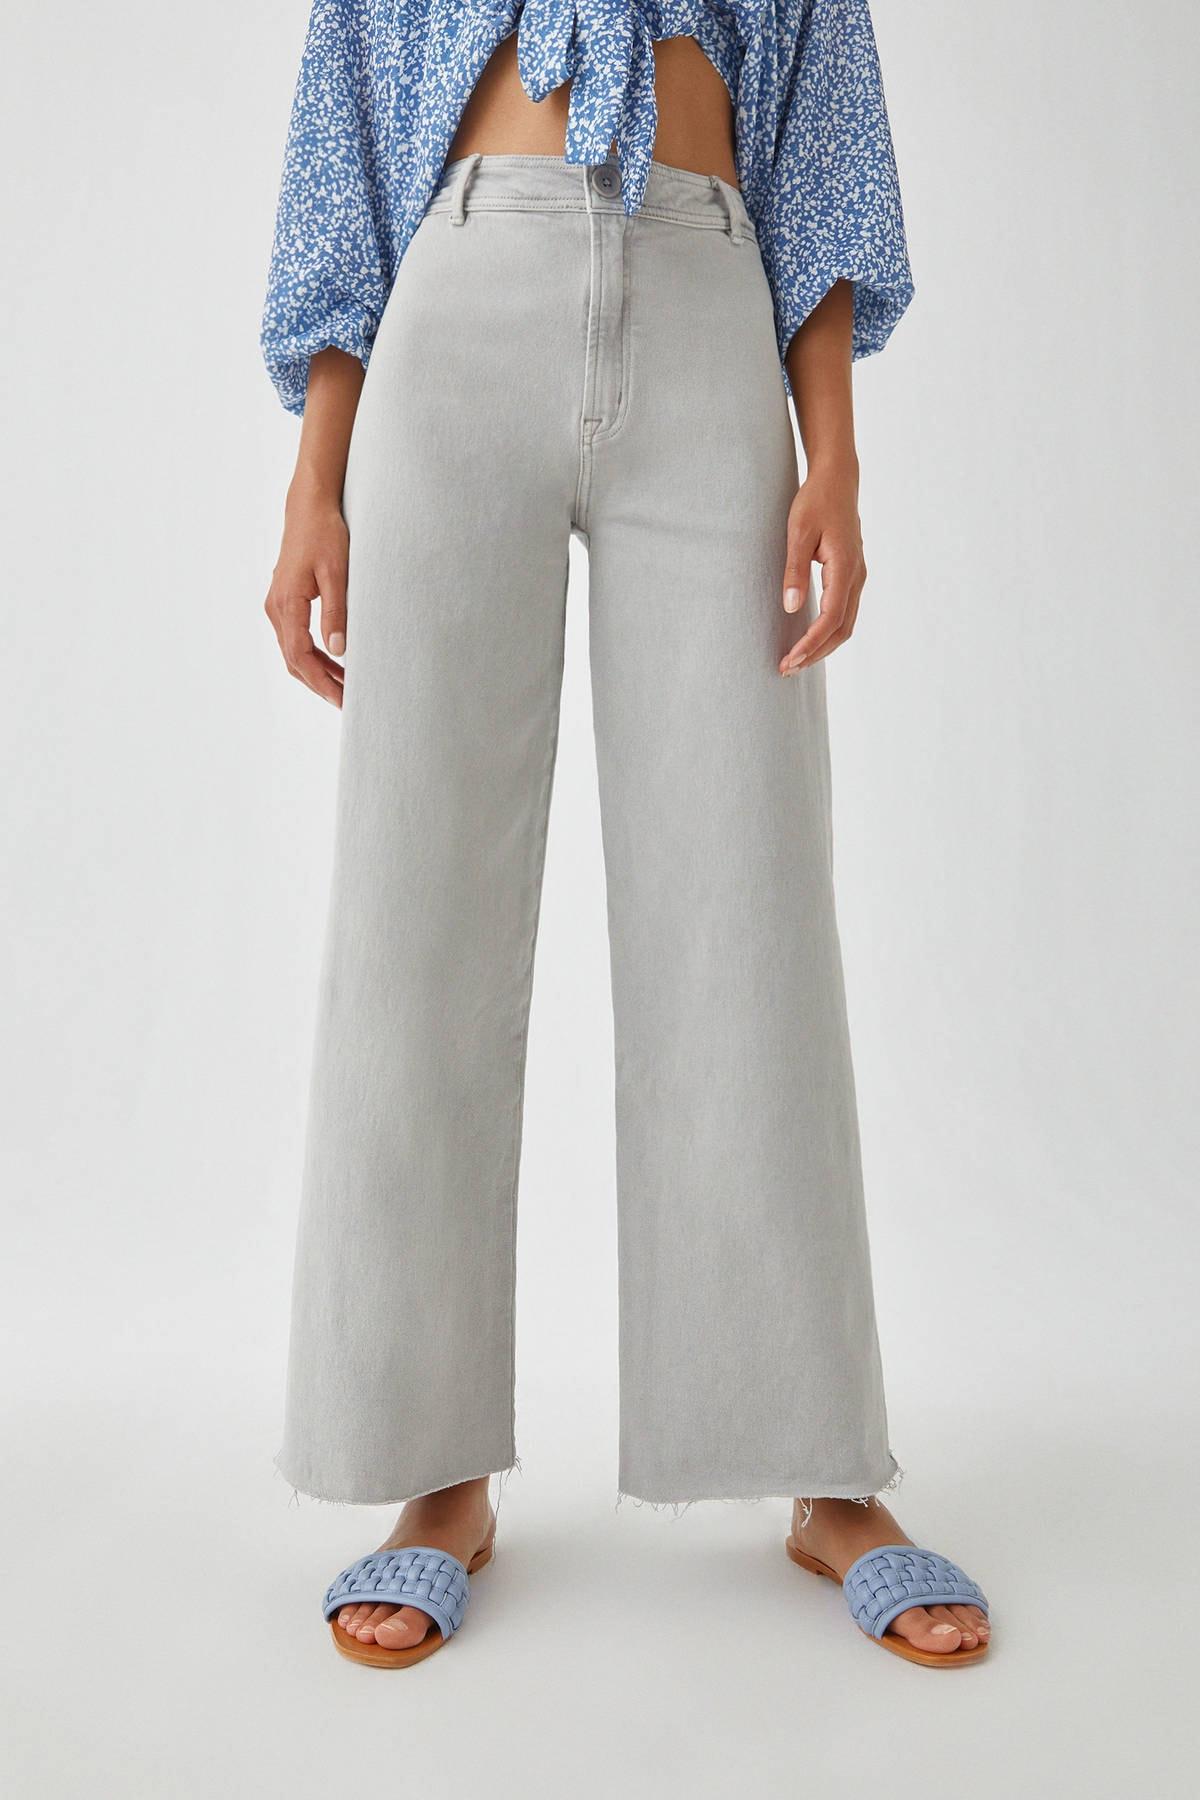 Pull & Bear Kadın Gri Yüksek Bel Crop Fit Pantolon. 09678302 0